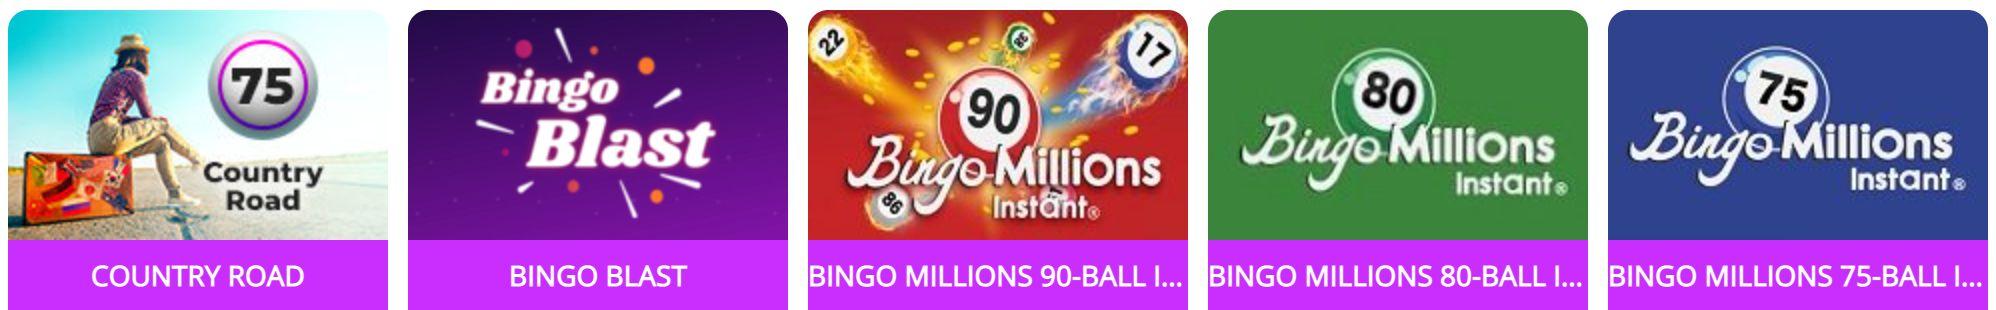 Bingo Fling Bingo Sites